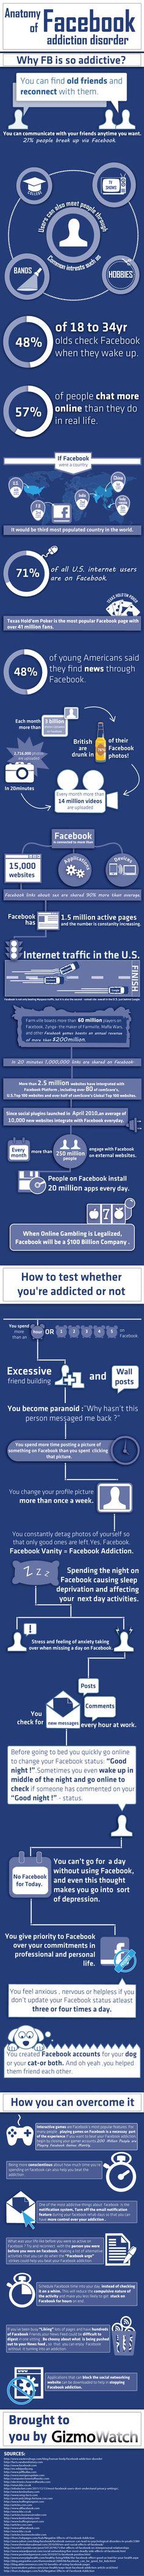 Anatomía de la adicción a FaceBook #infografia #infographic #socialmedia